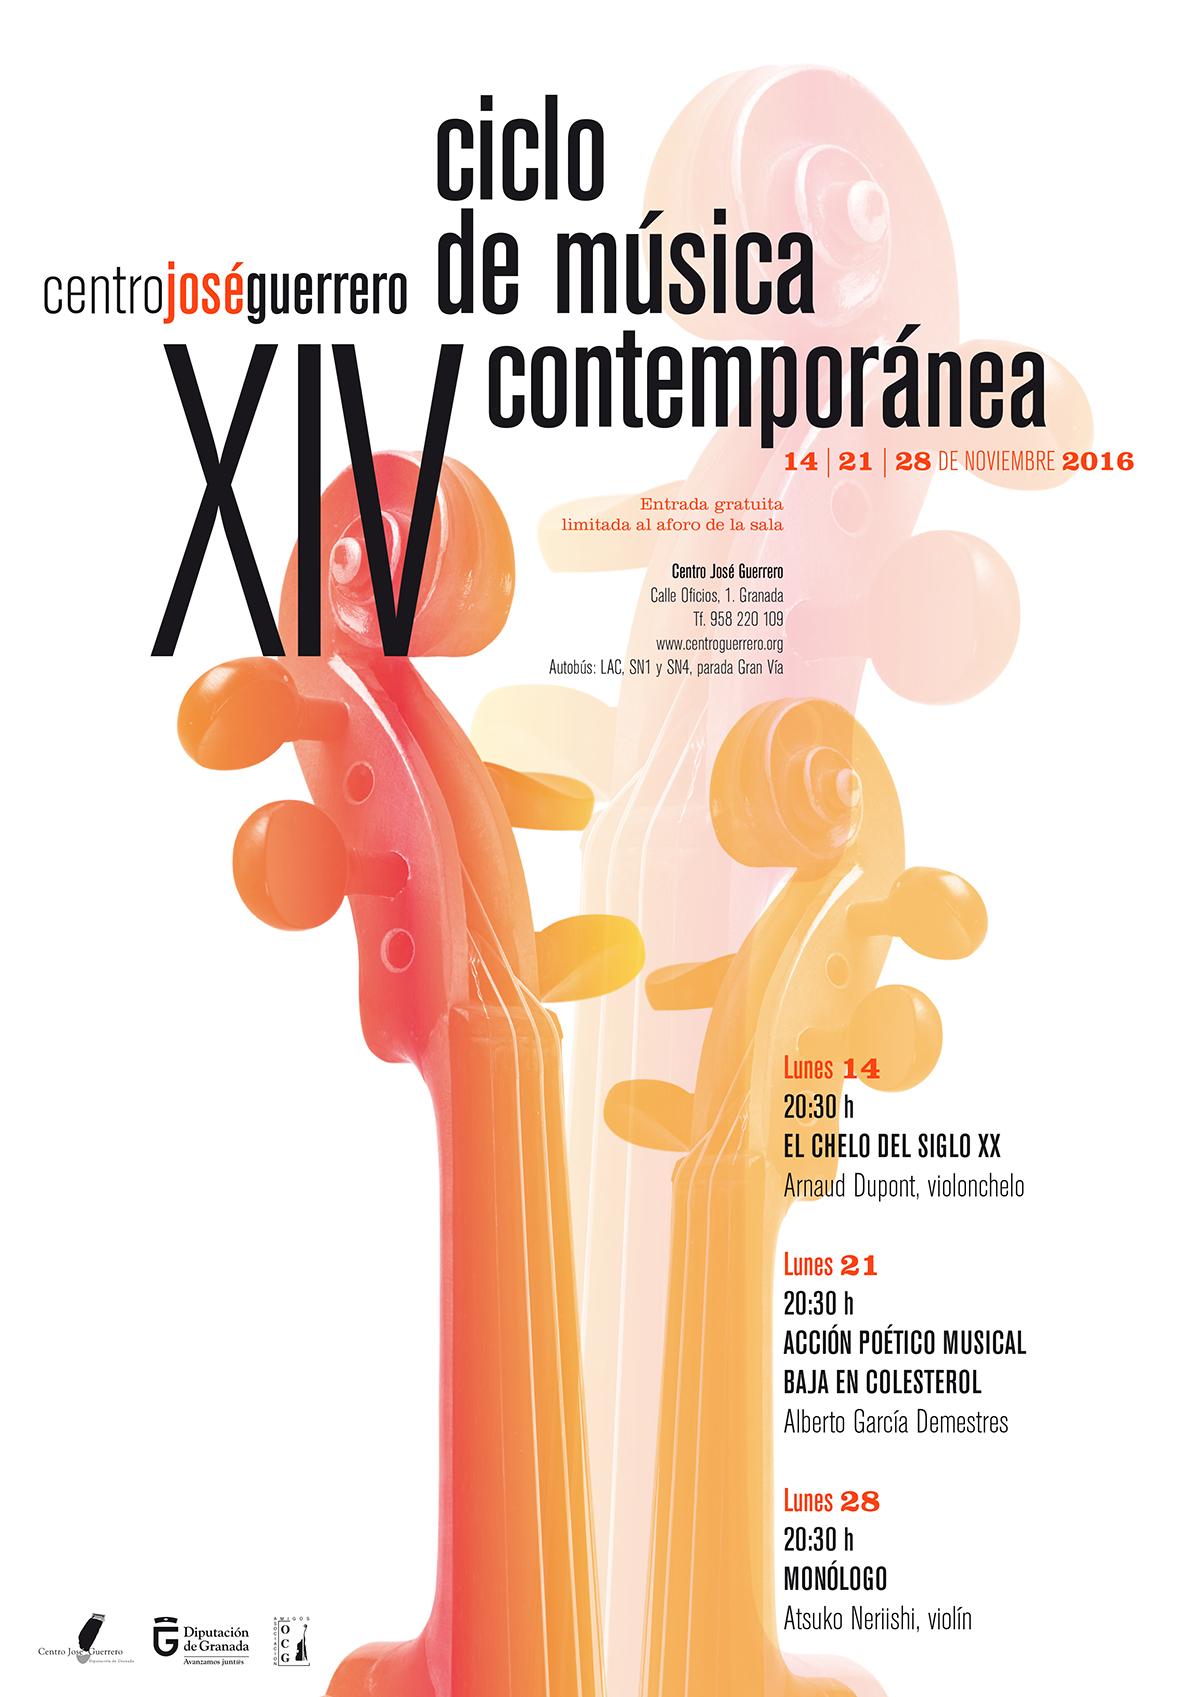 xiv-ciclo-de-musica-contemporanea_cartel